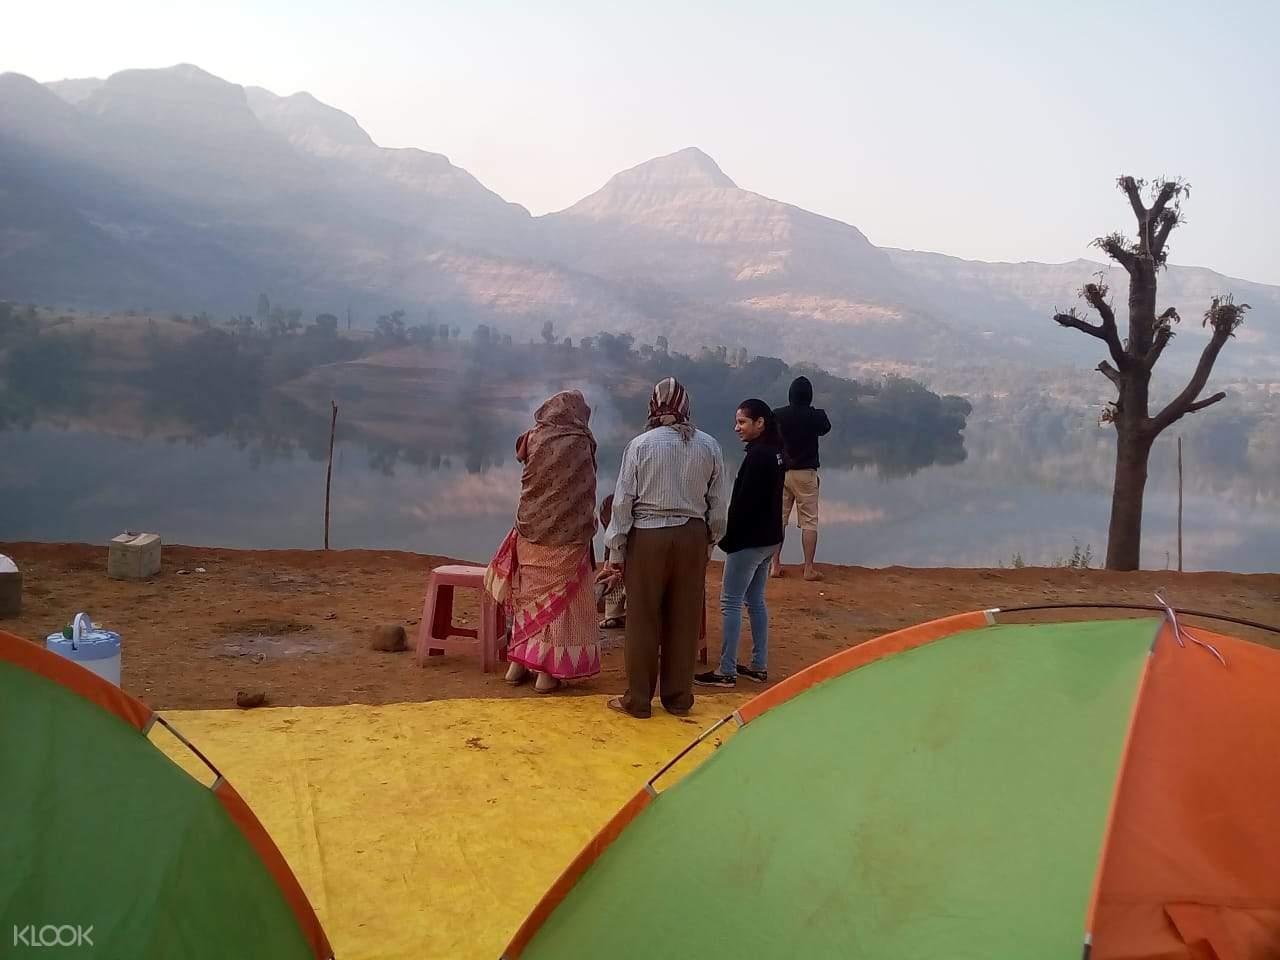 tents and lake